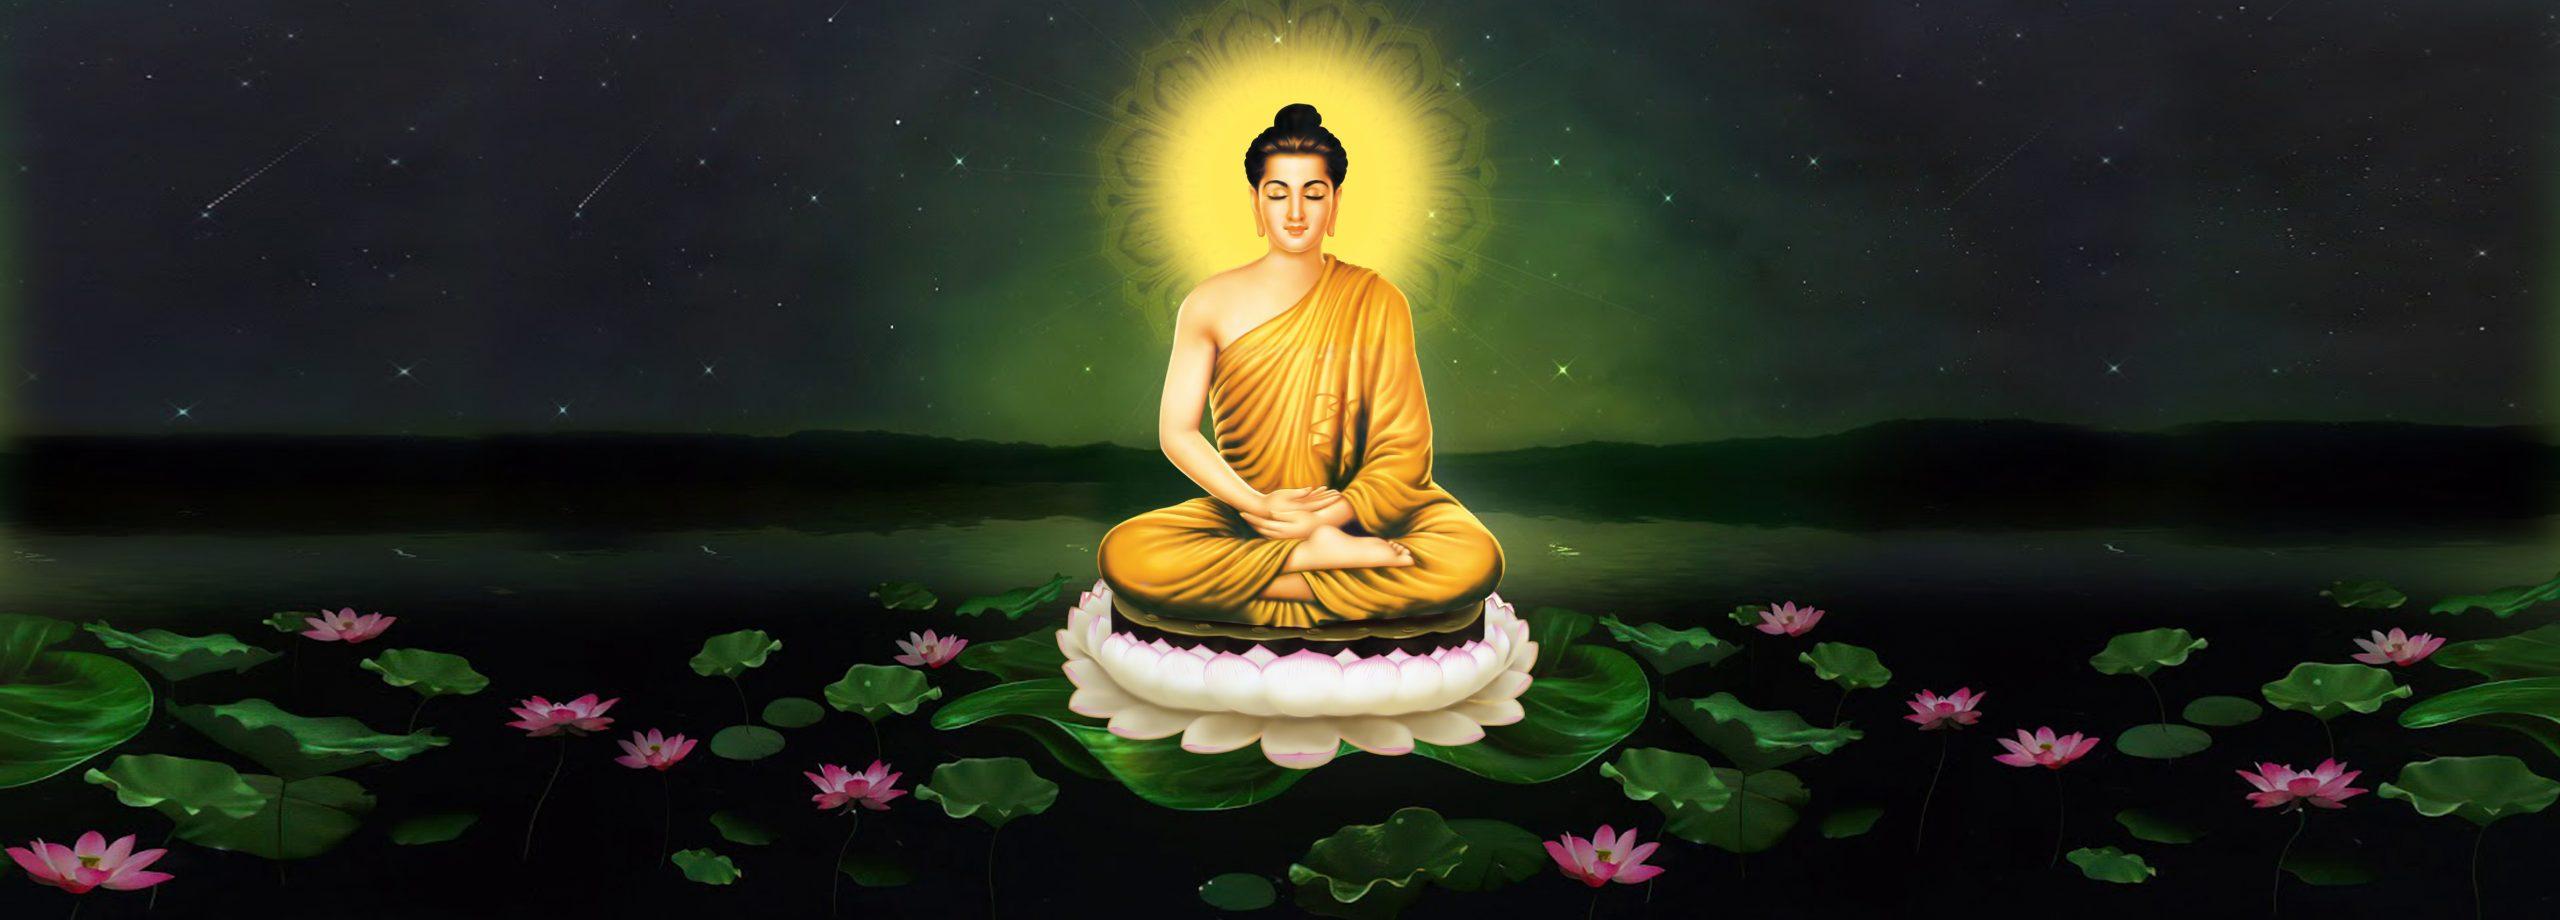 Tôn ảnh Phật Thích Ca ảnh cover facebook – Image of Shakymuni Buddha for Facebook cover